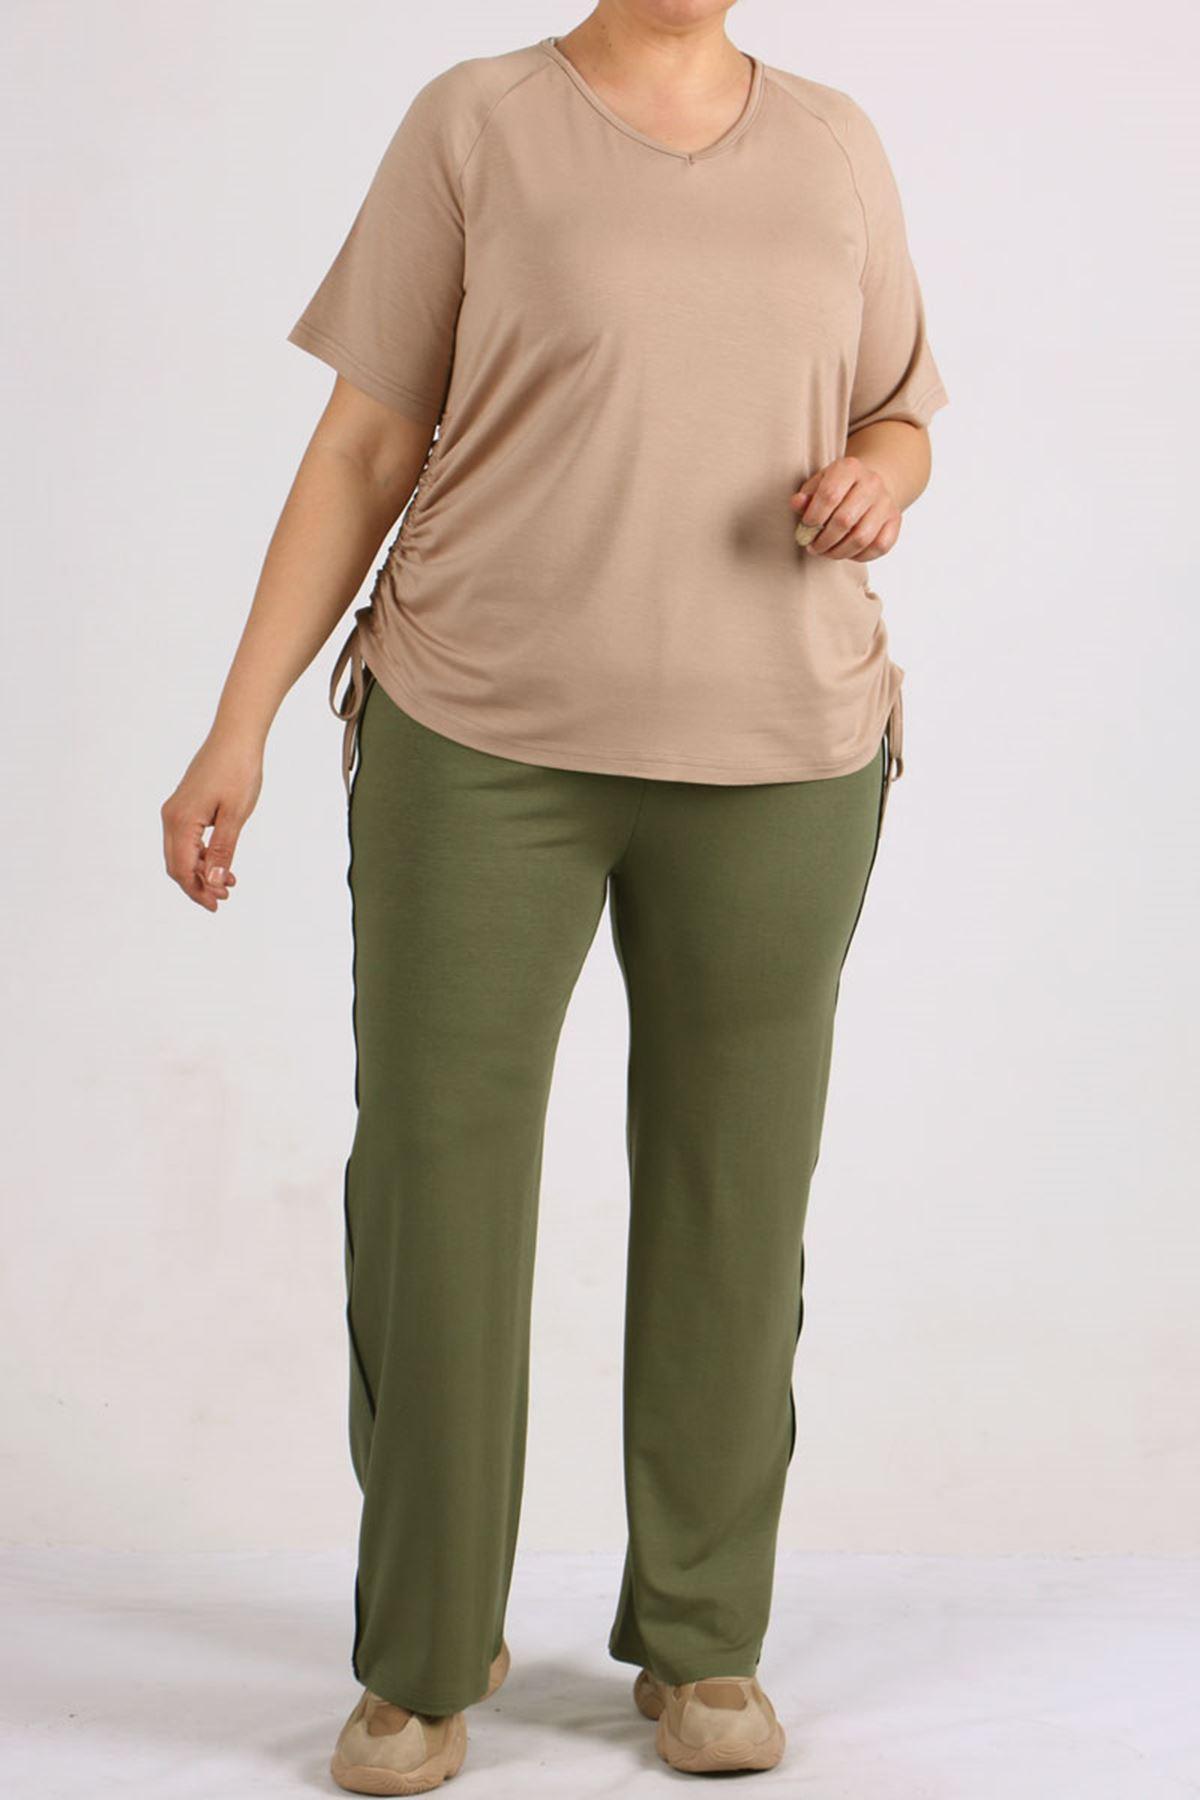 8530 Plus Size Raglan Sleeve T-Shirt - Stone